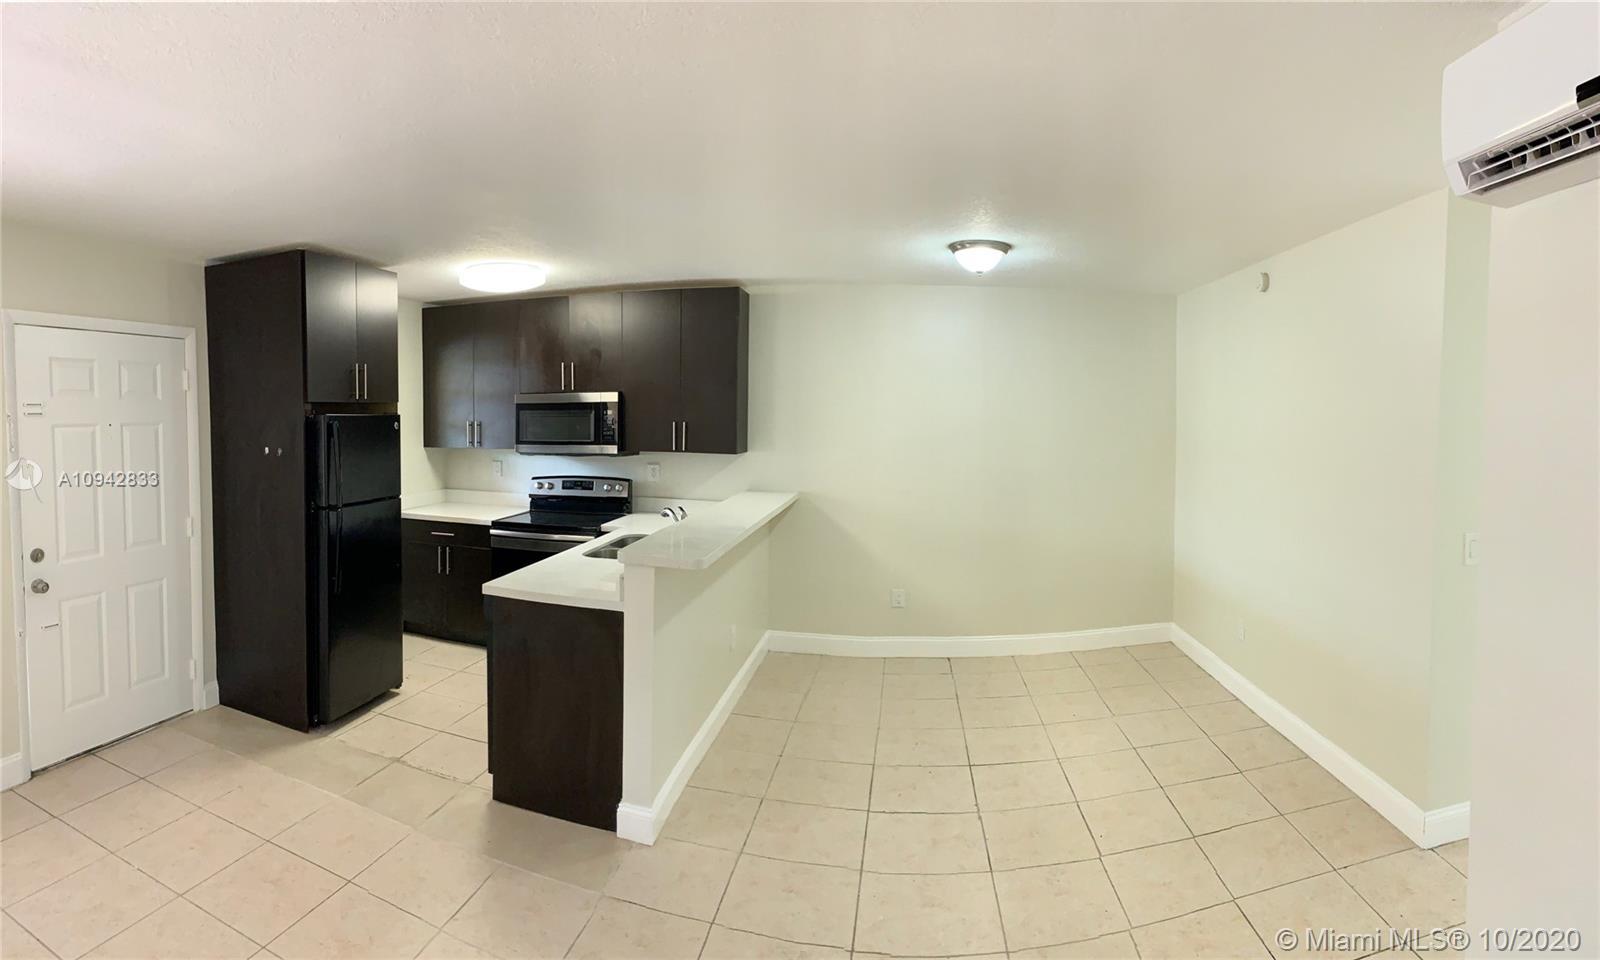 1-8  /   sq. ft. $ 2020-10-14 0 Photo